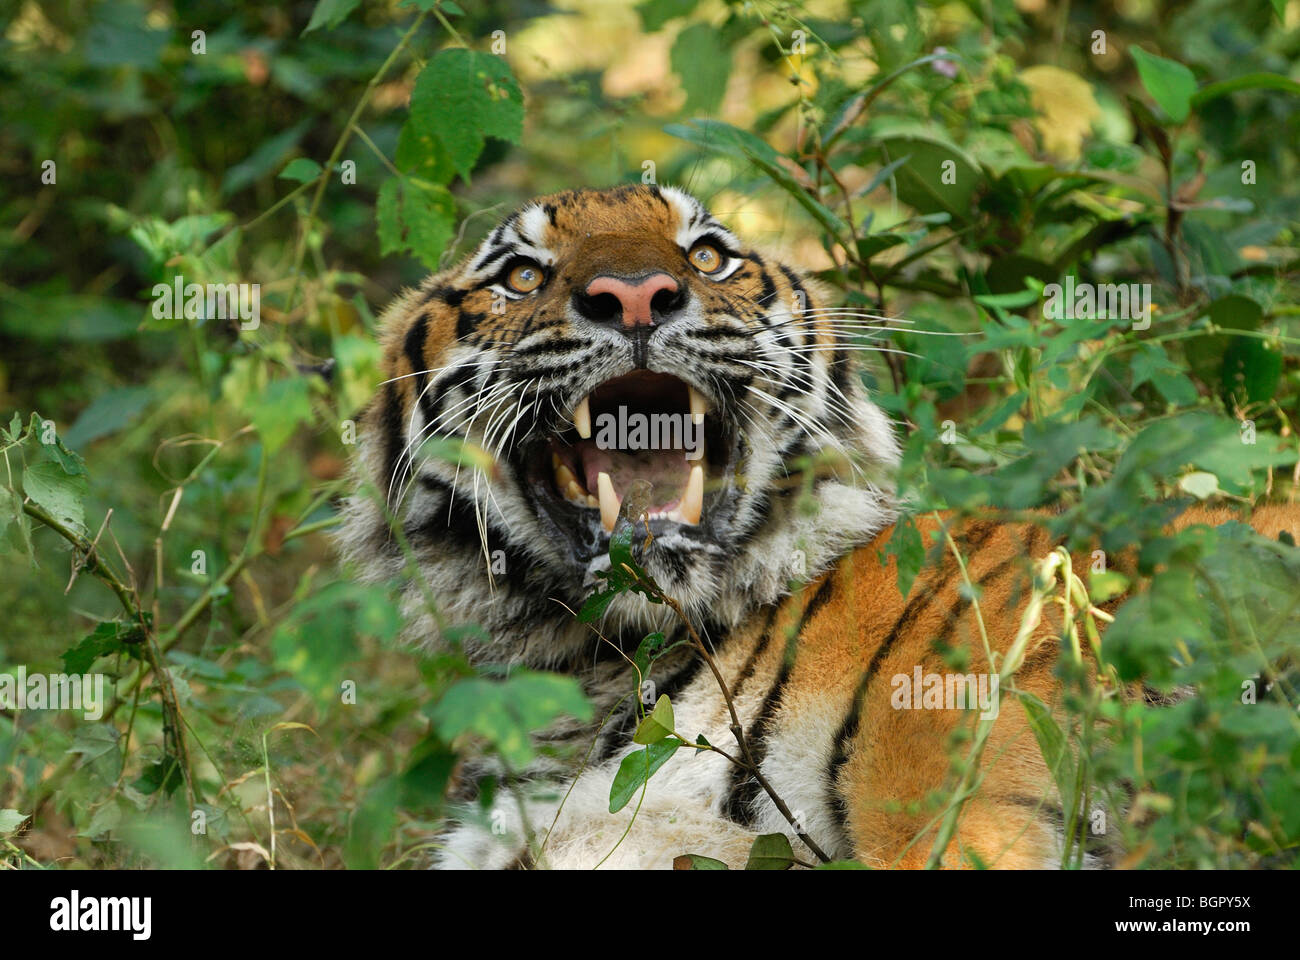 Tigre (Panthera tigris), grognements adultes, Thaïlande Photo Stock